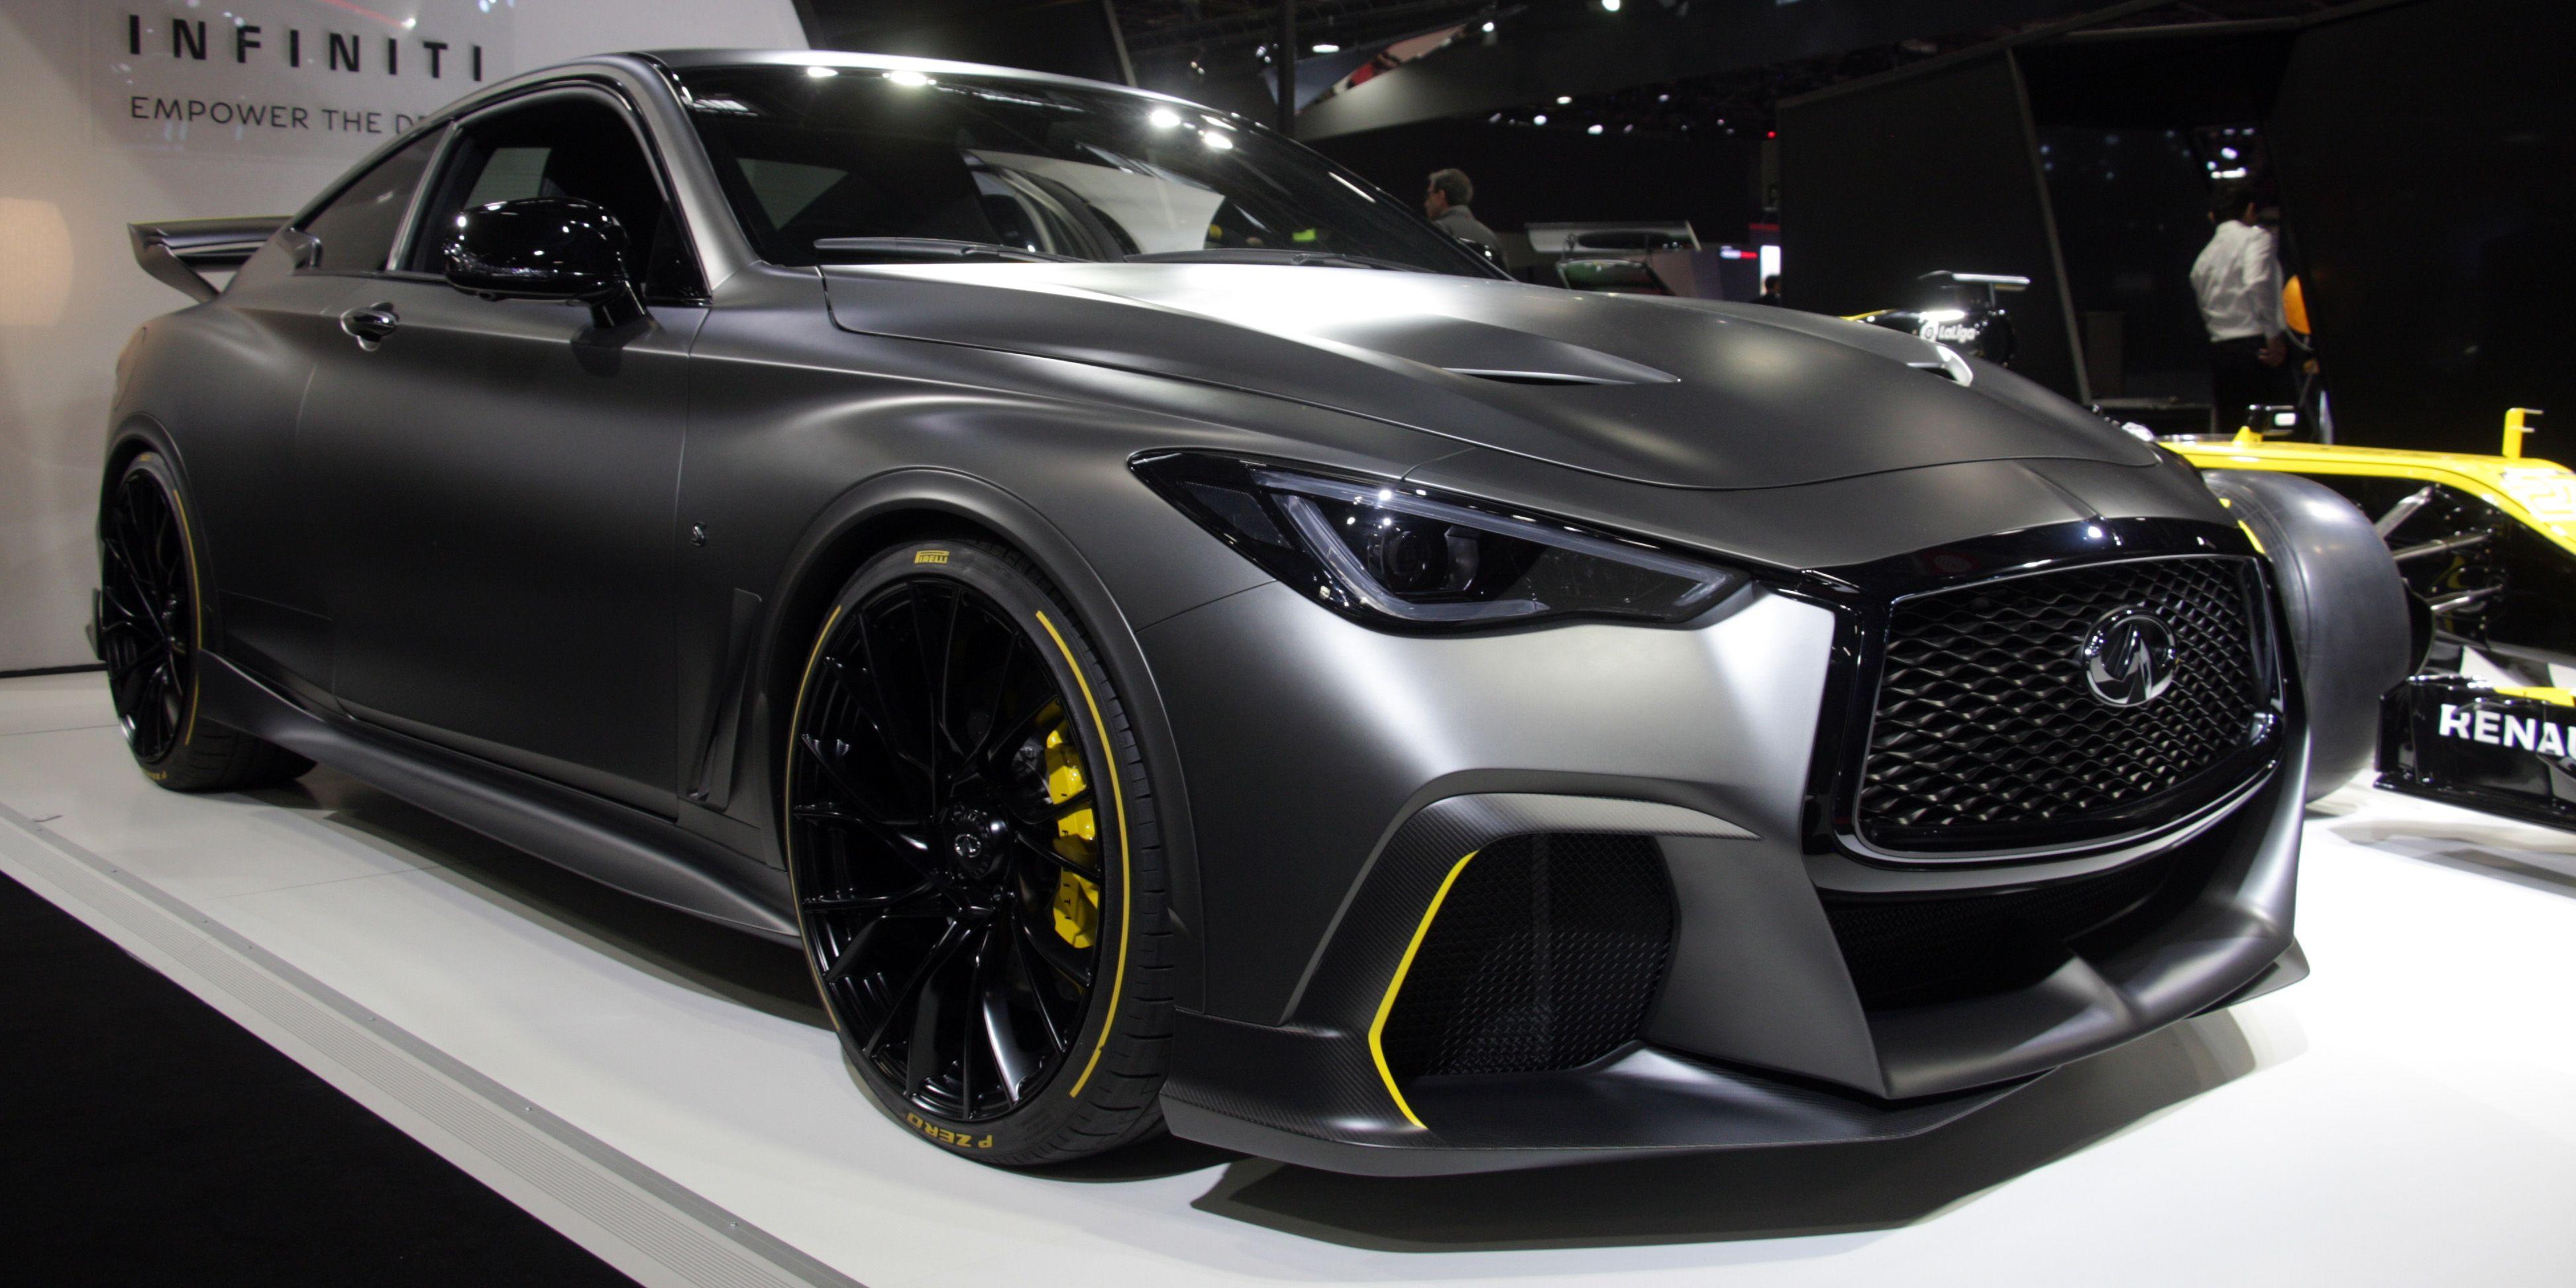 2021 Infiniti Q60 Project Black S Price